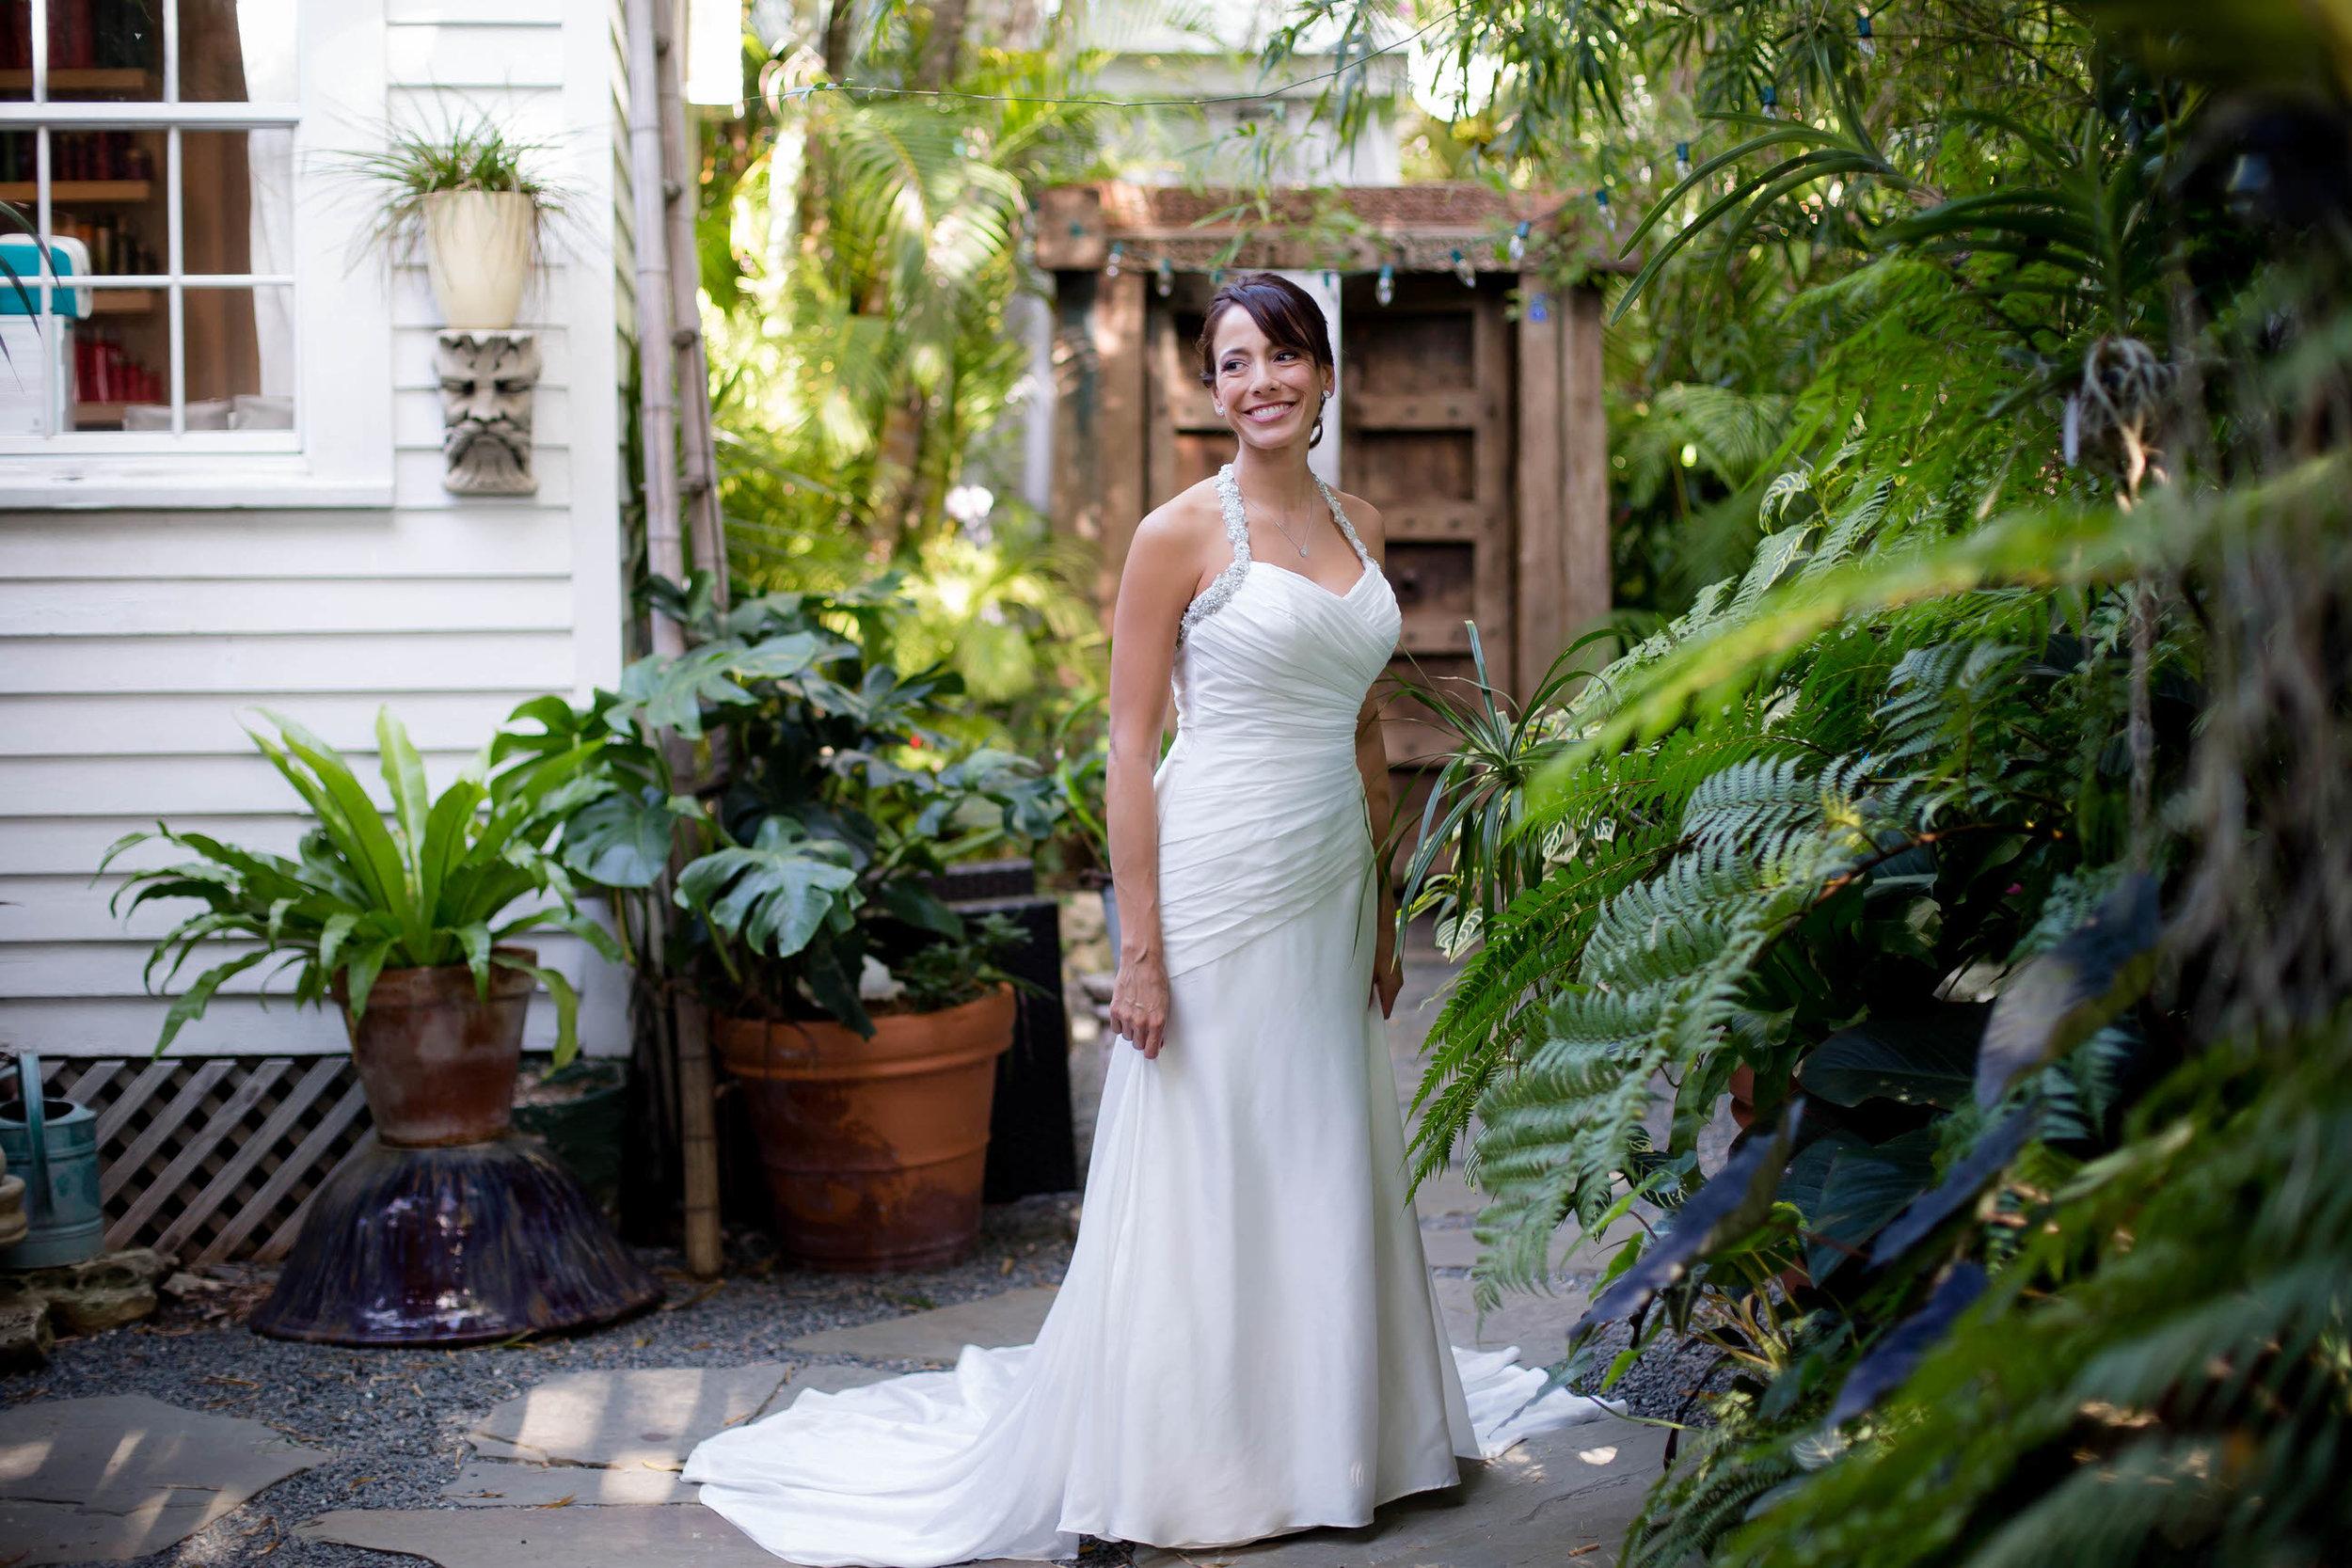 gorgeous_bride_portrait_tiny_house_photo.jpg